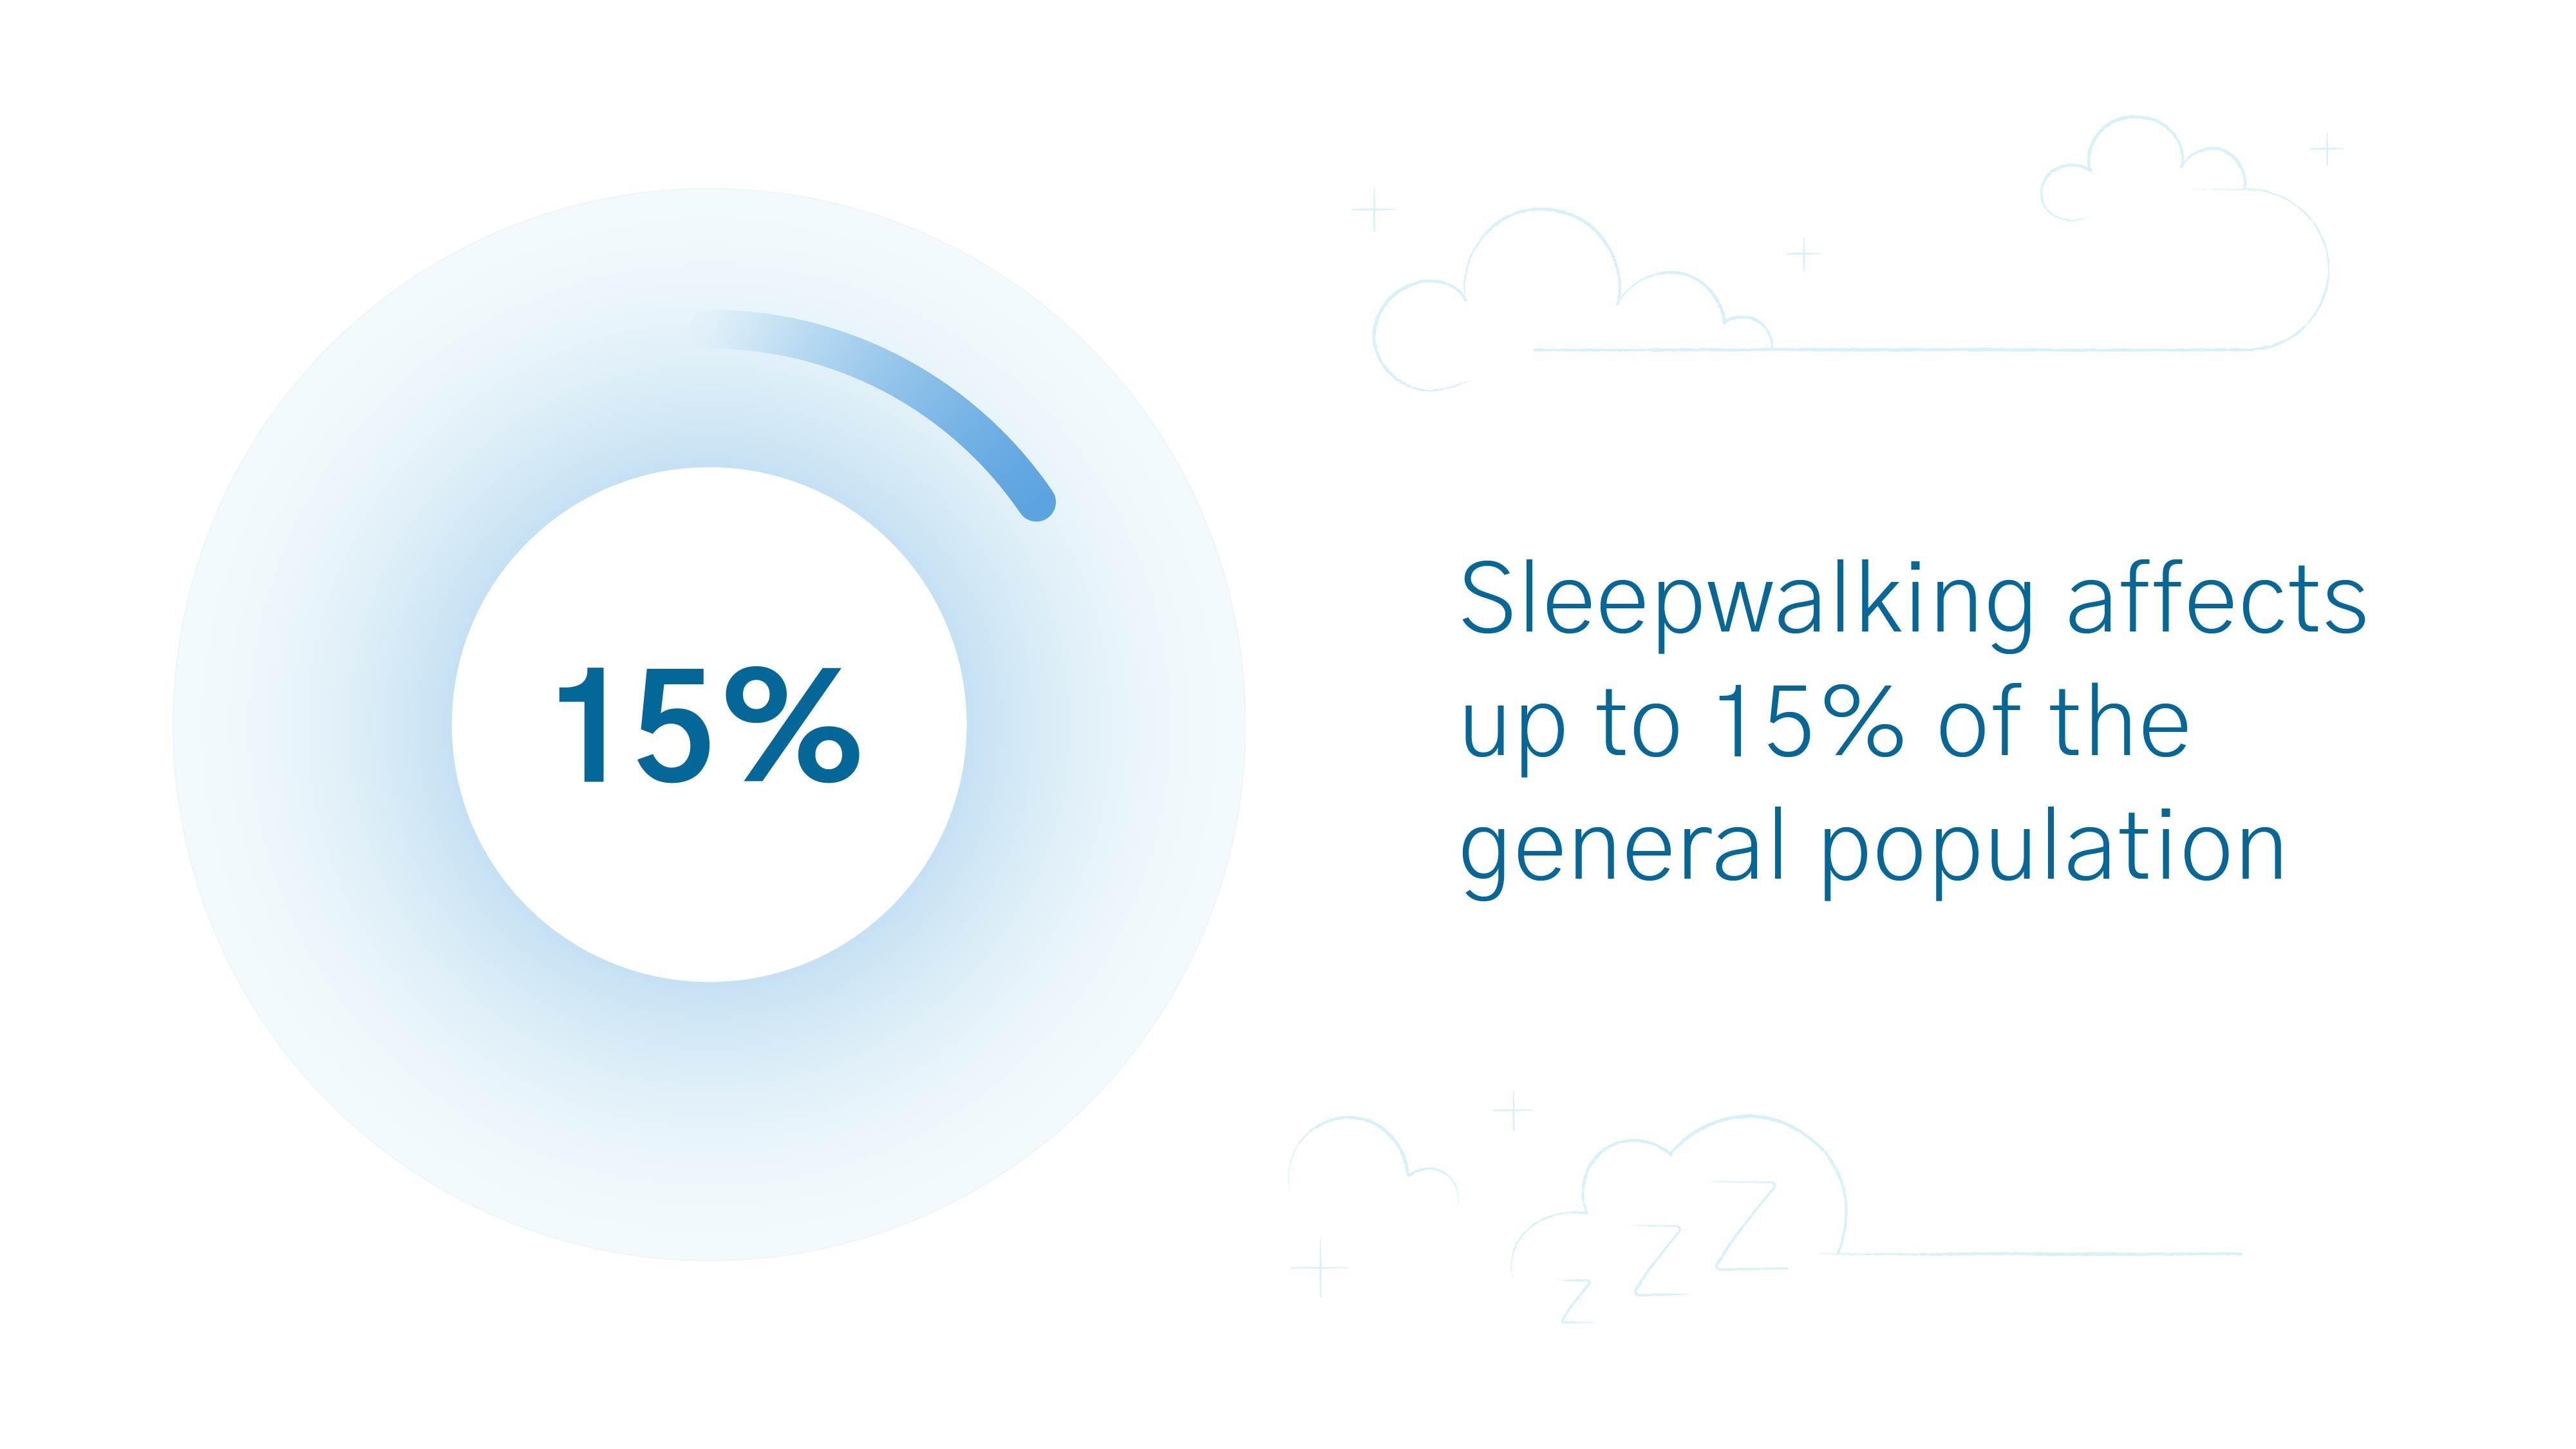 Sleepwalking statistics